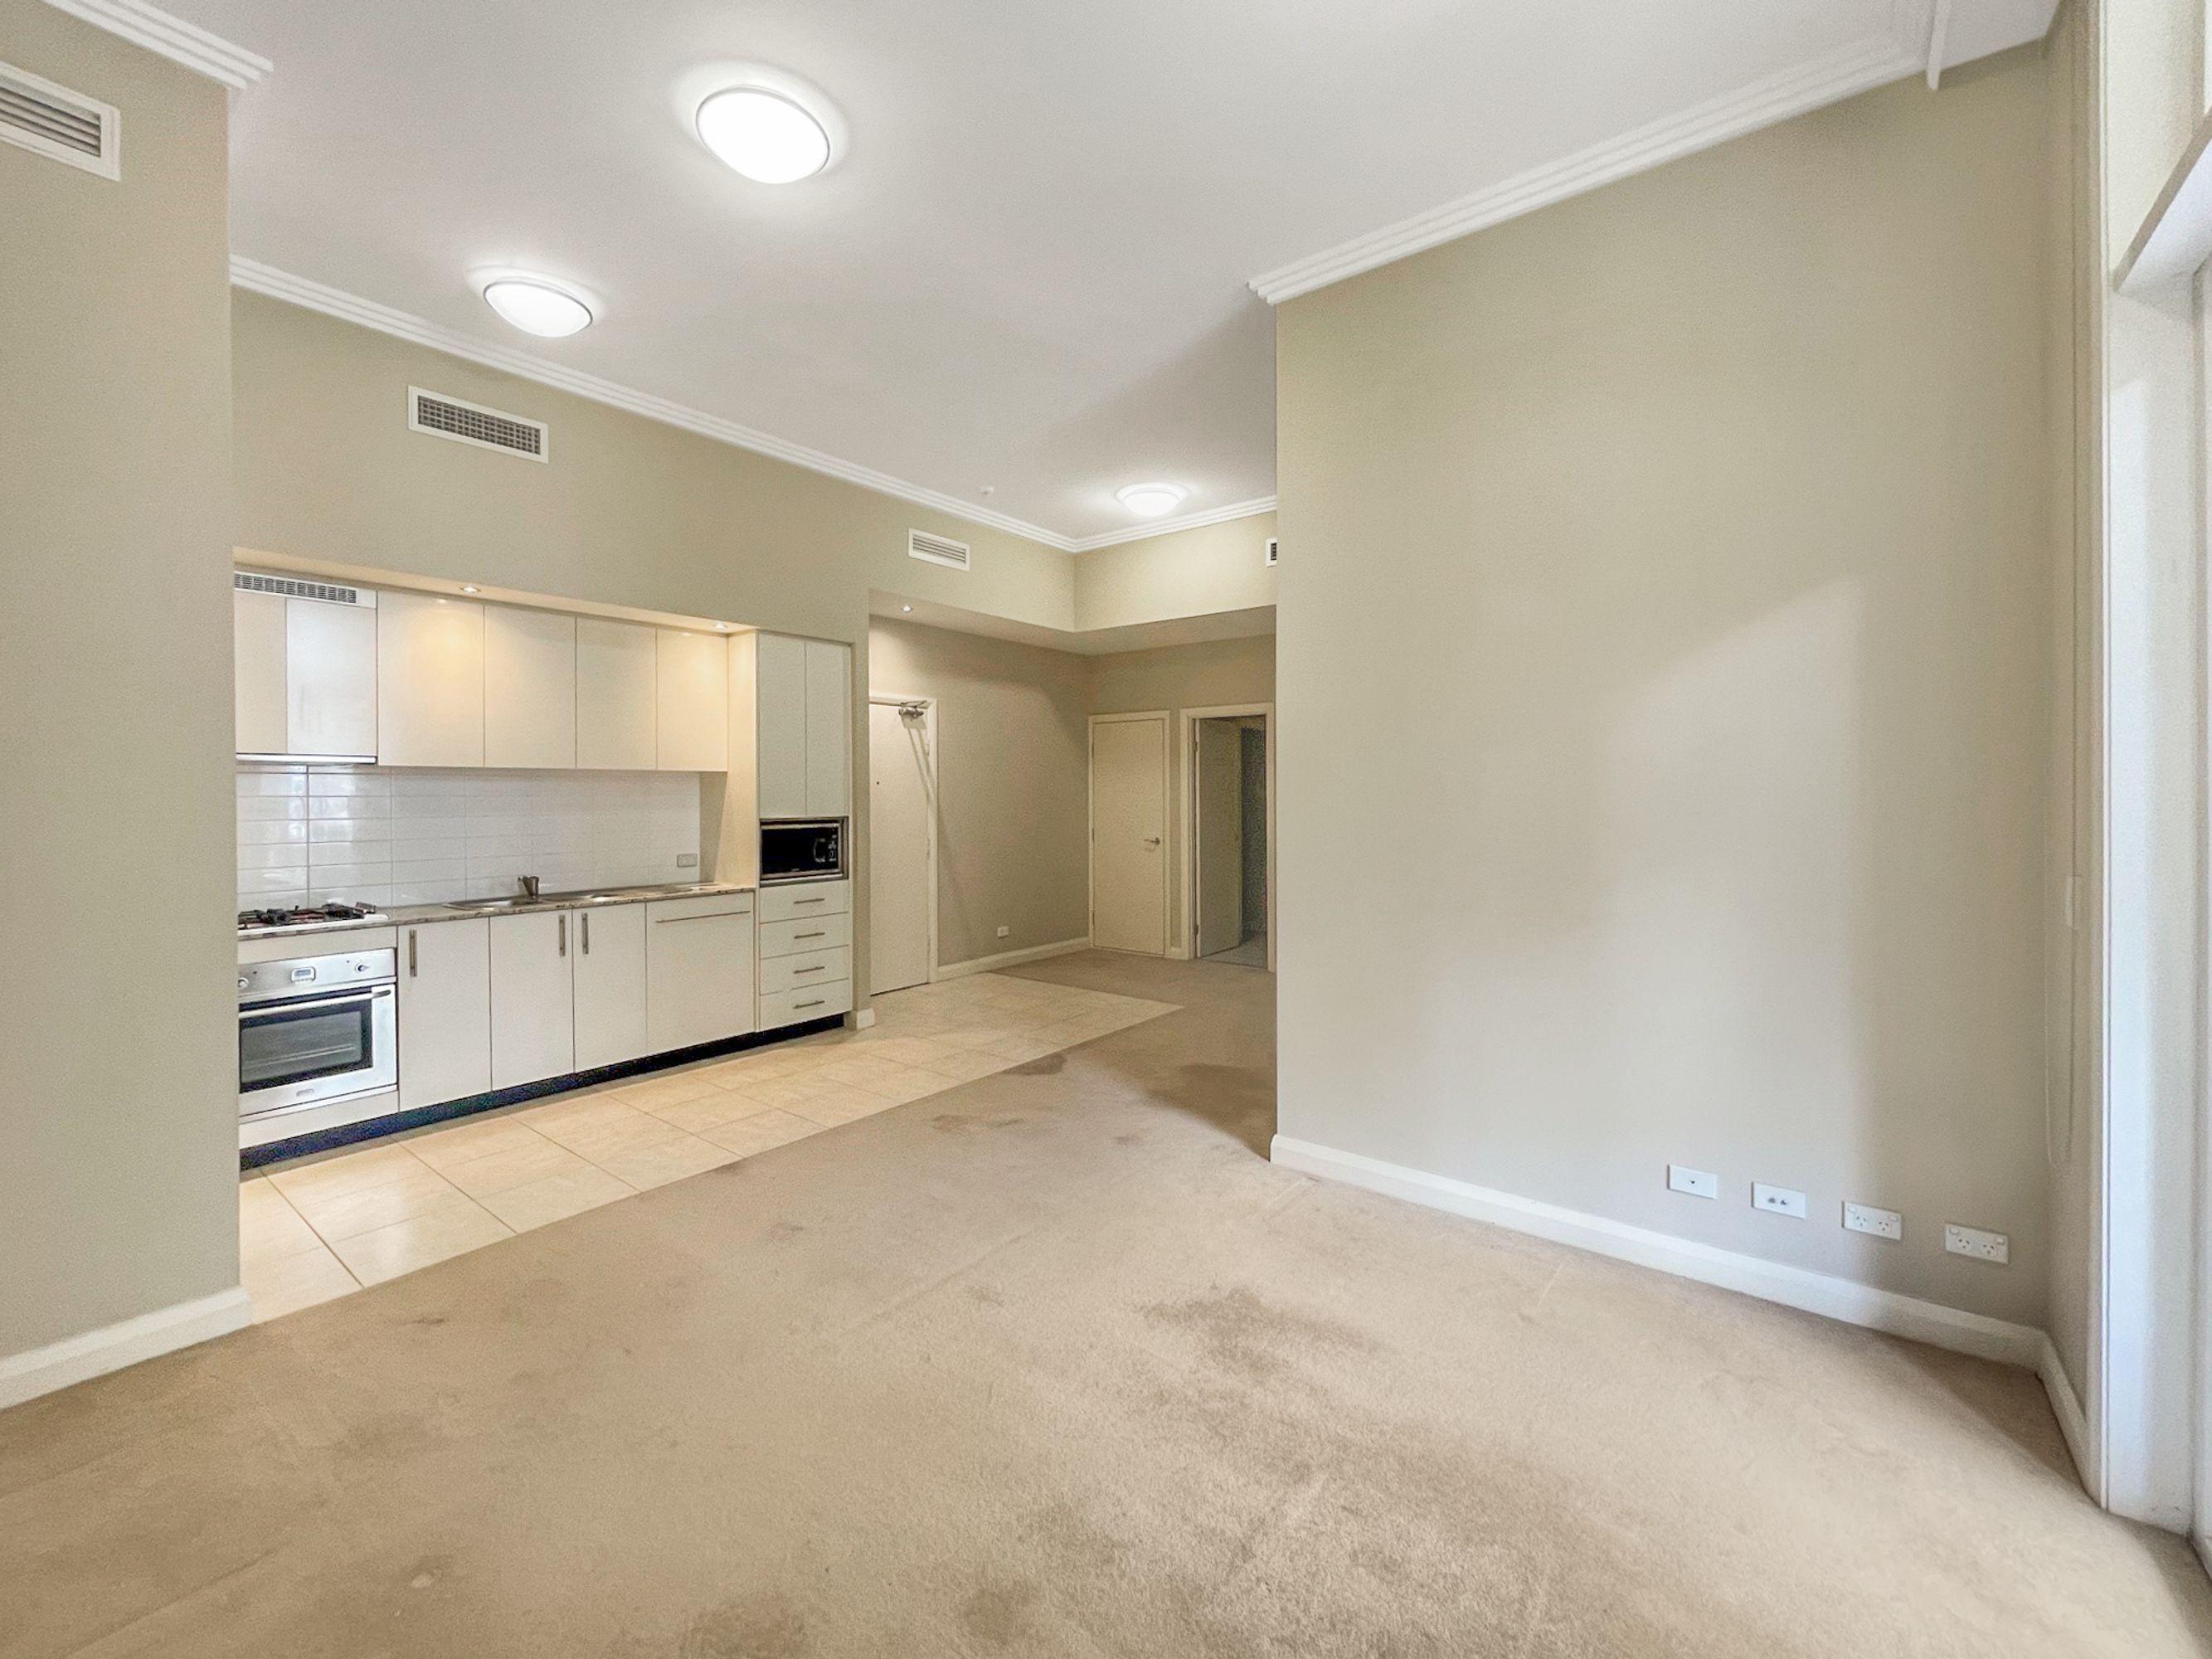 9/25 Angas Street, Meadowbank, NSW 2114